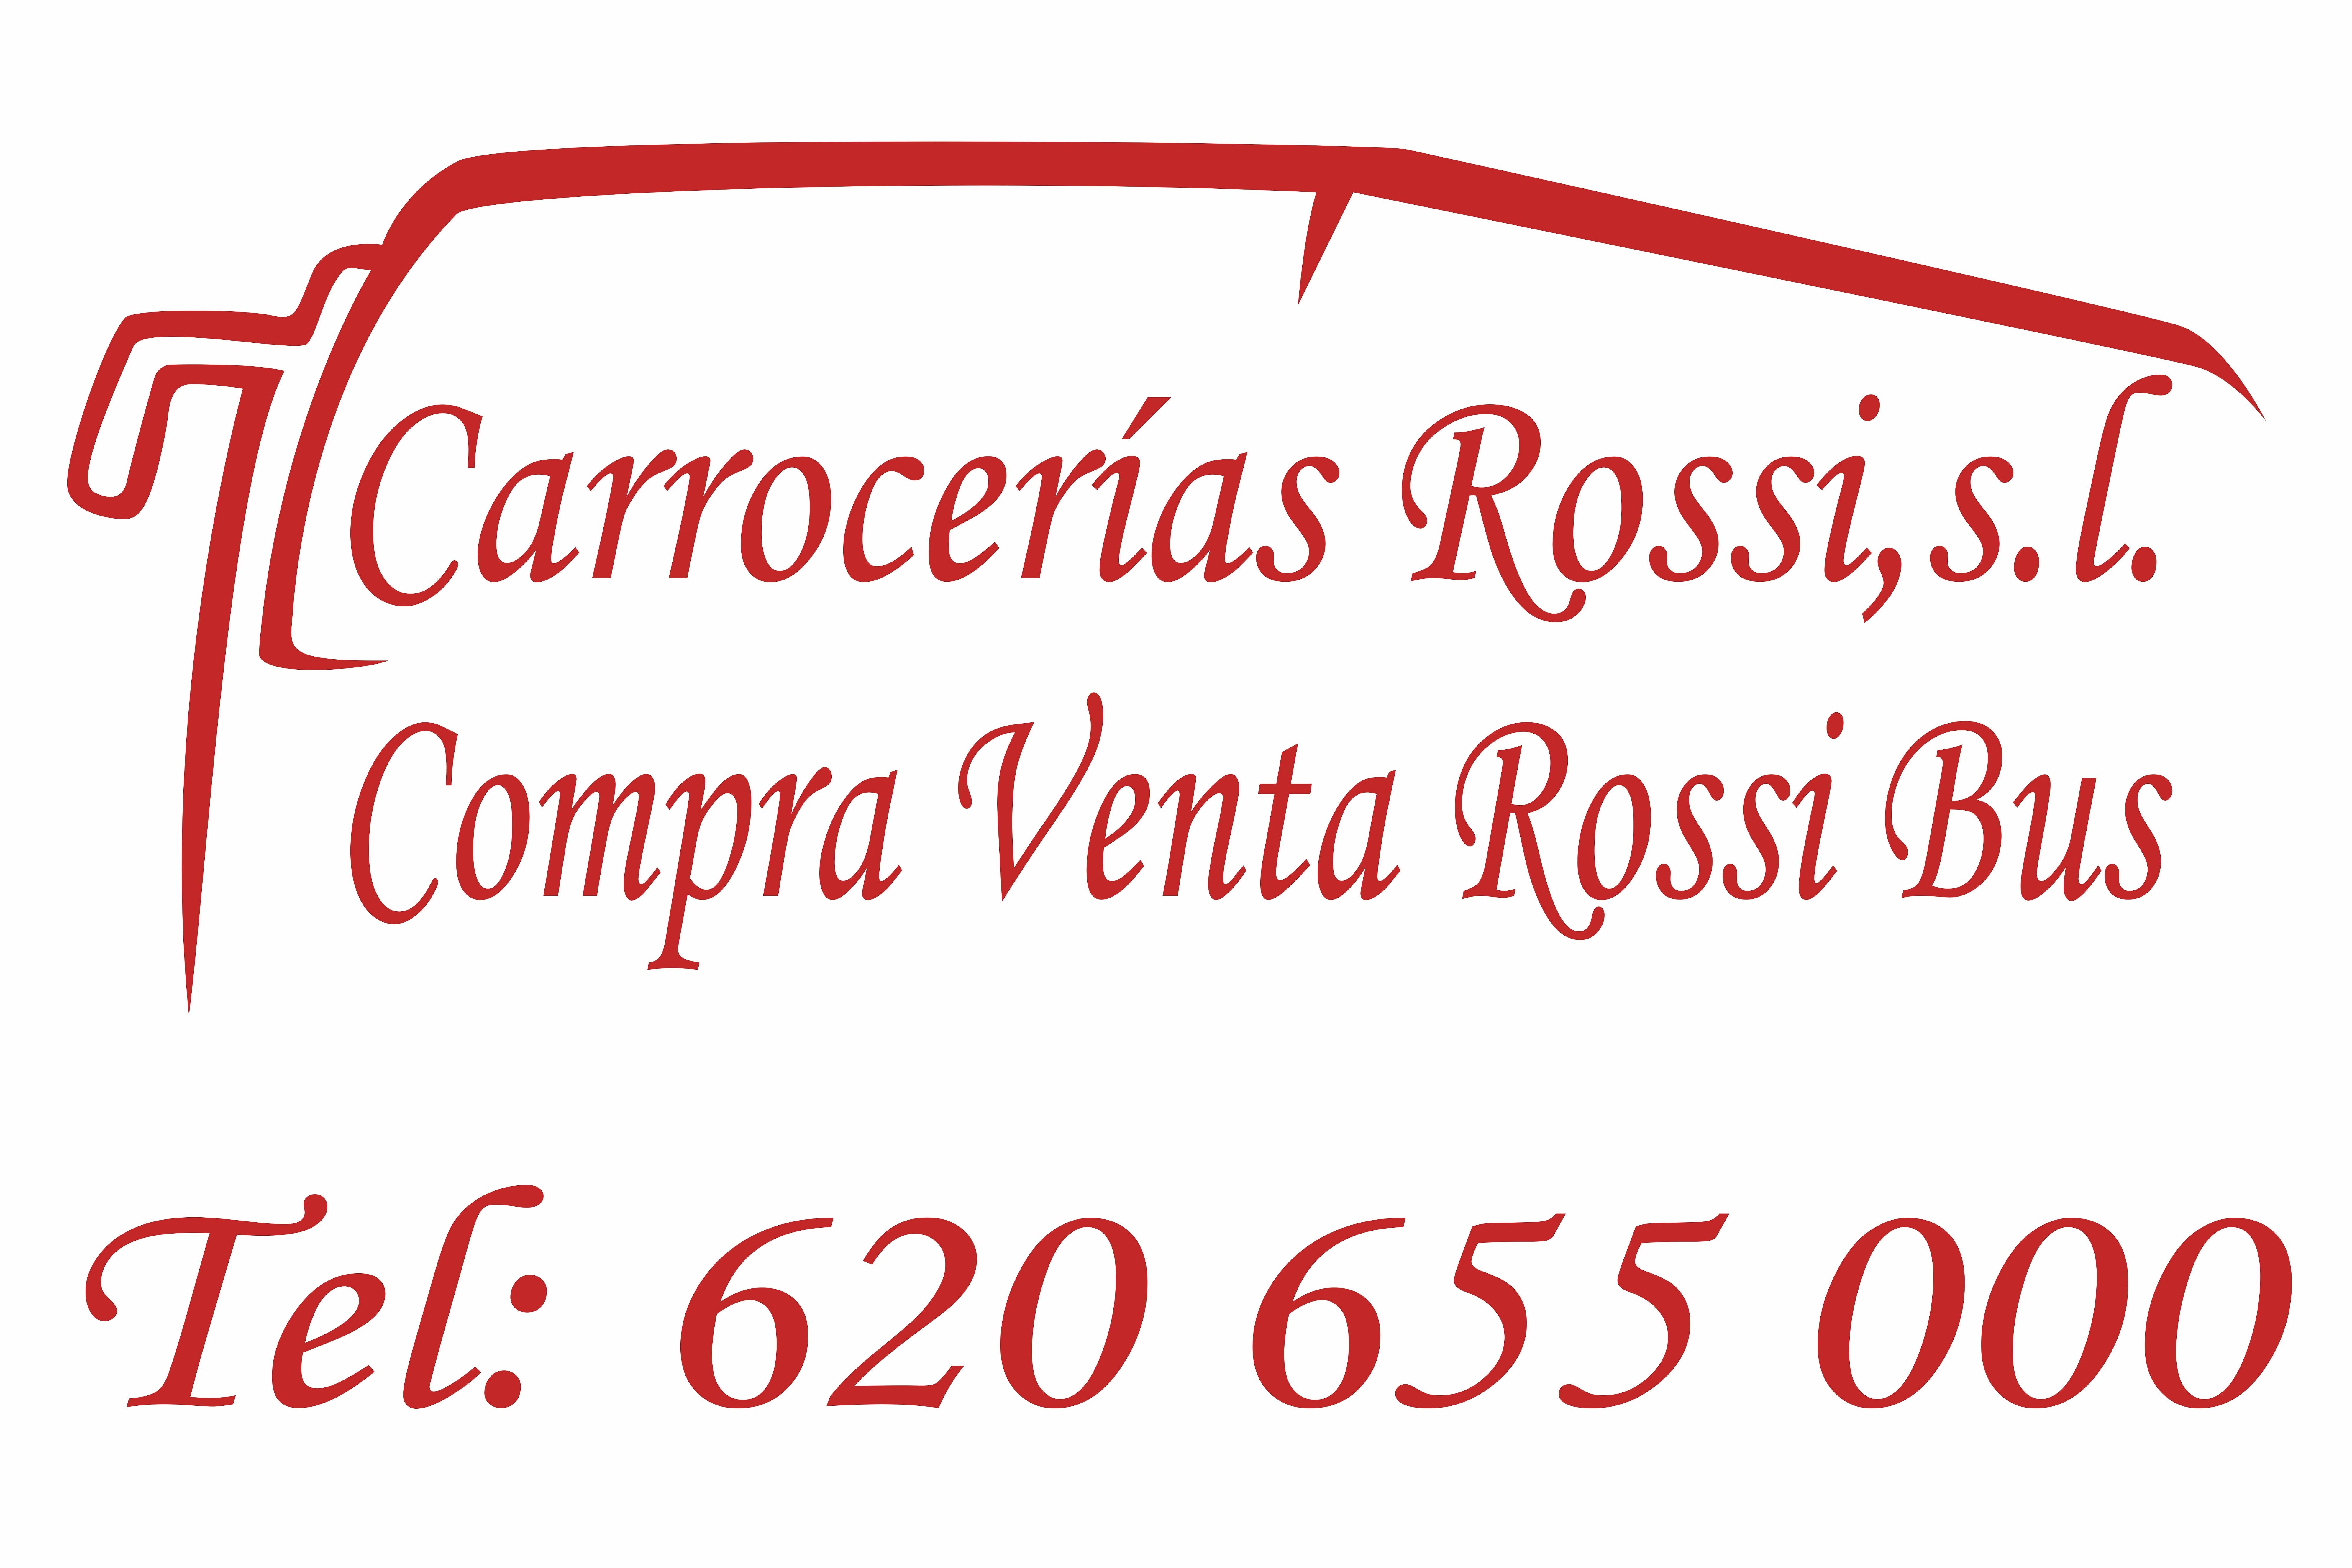 CARROCERIAS ROSSI